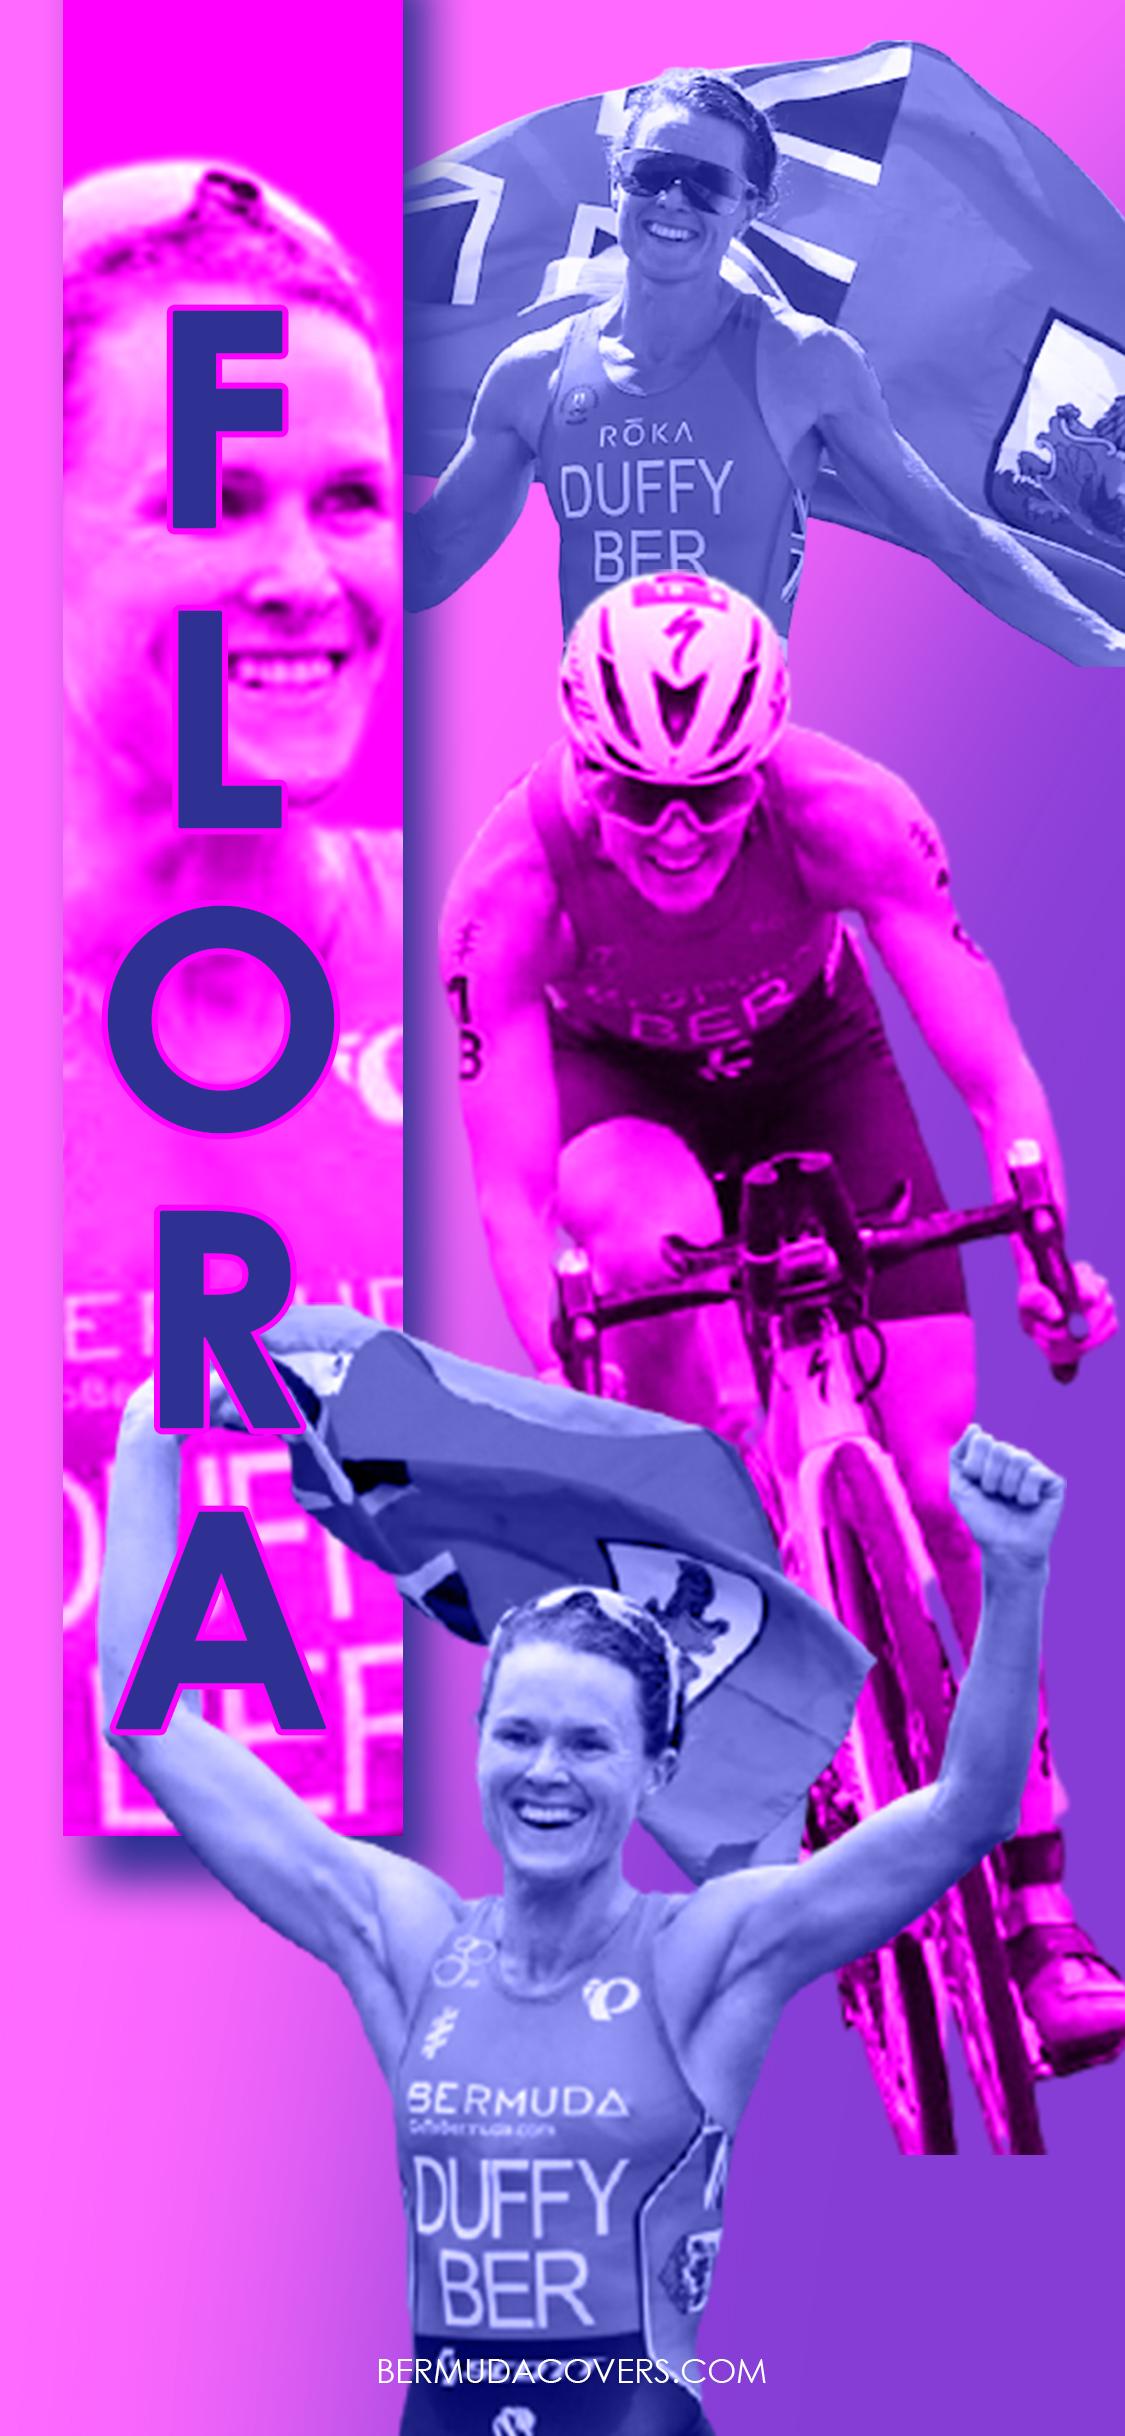 Flora Duffy Olympics Bermuda Bernews Mobile phone wallpaper lock screen design image photo 4dAAAZNF